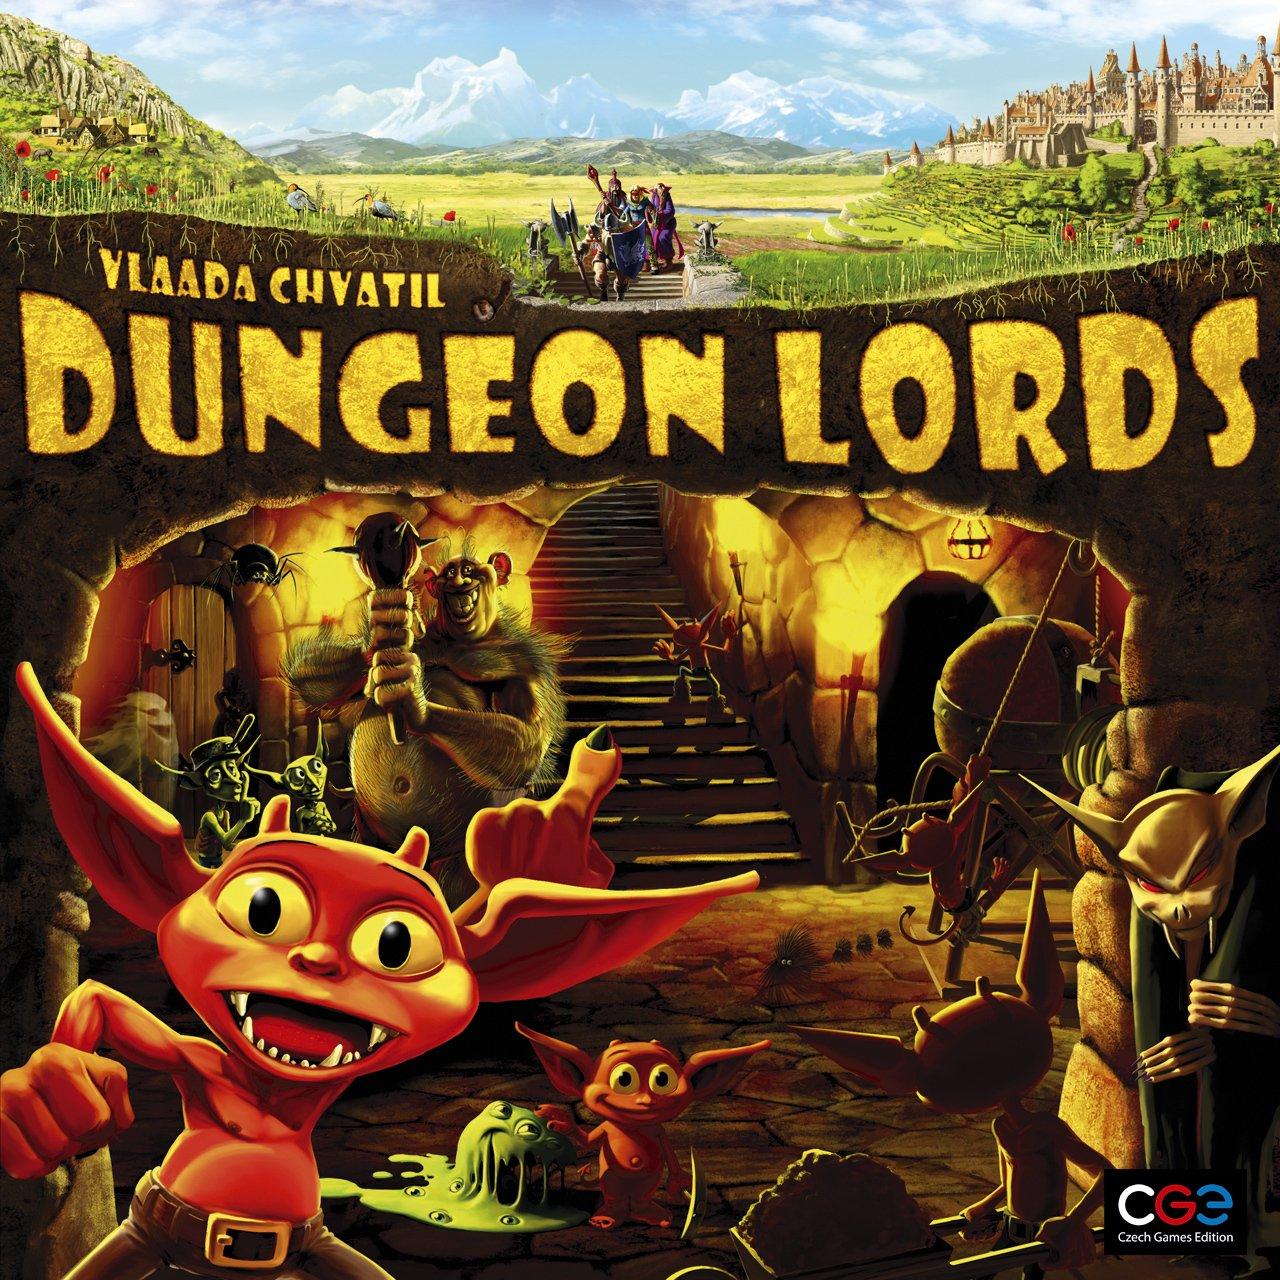 Dungeon lords gioco da tavolo gdt tana dei goblin - Dungeon gioco da tavolo ...